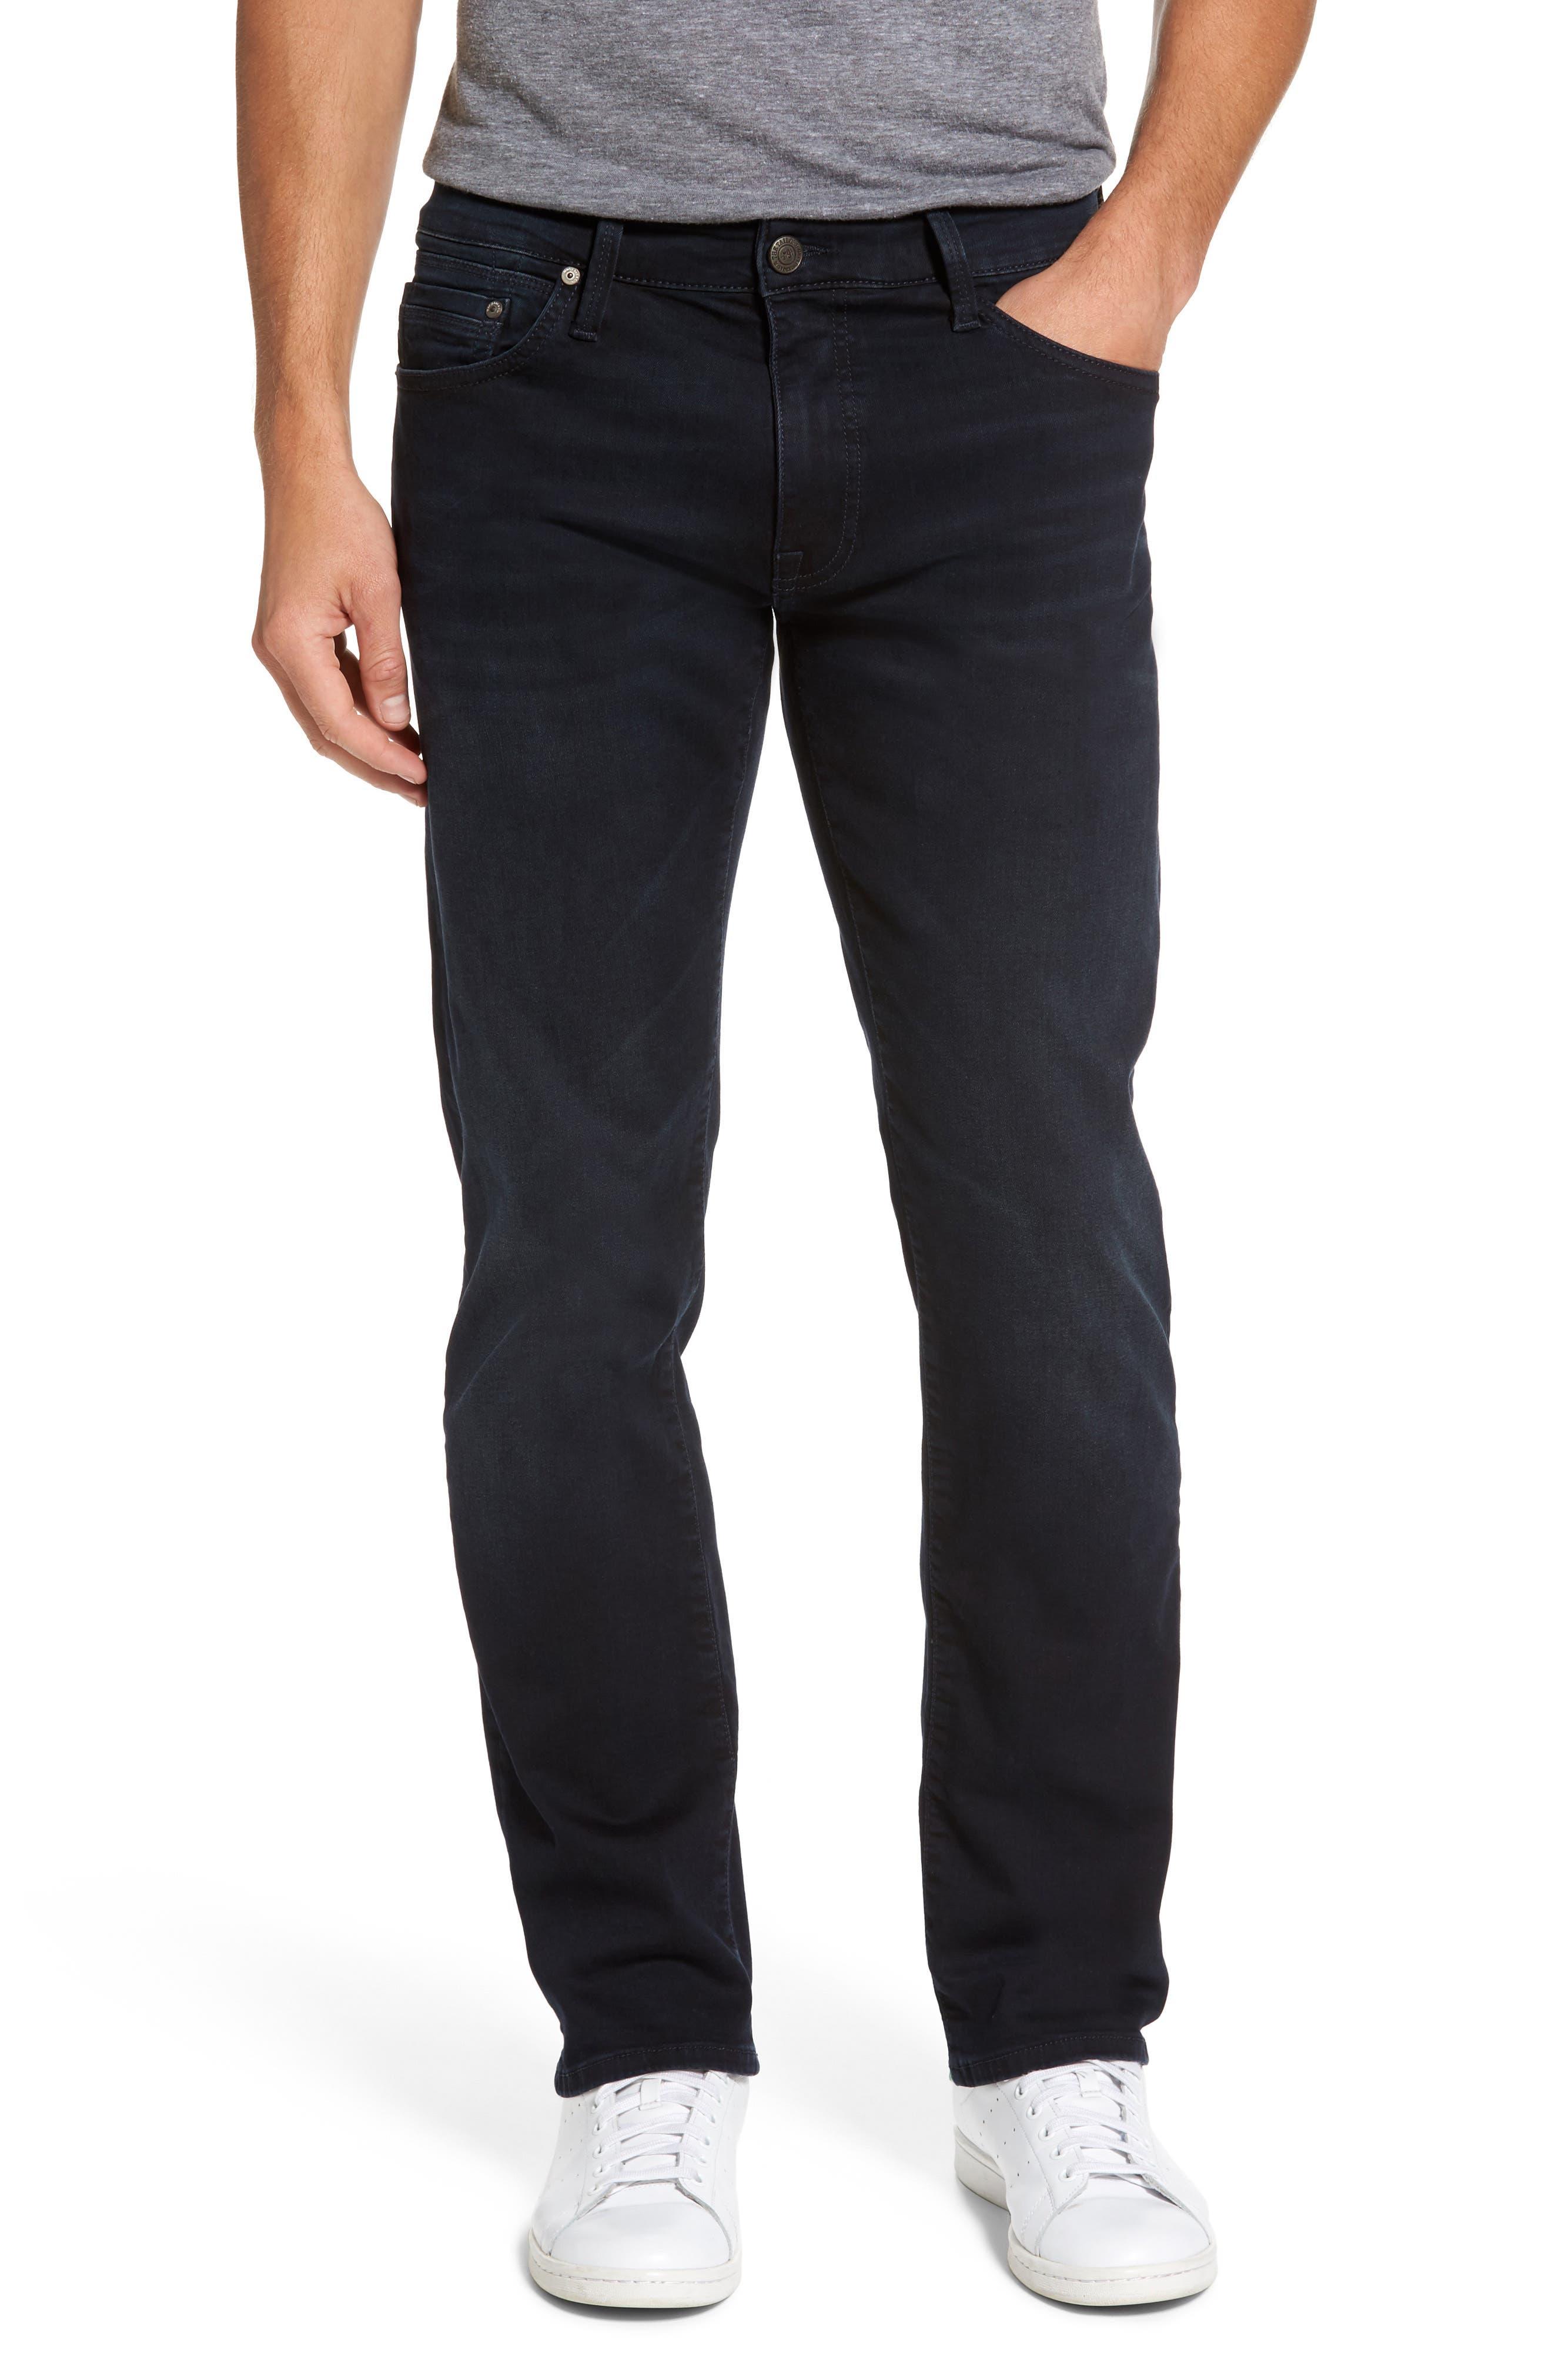 Alternate Image 1 Selected - Mavi Jeans Zach Straight Leg Jeans (Brushed Williamsburg)